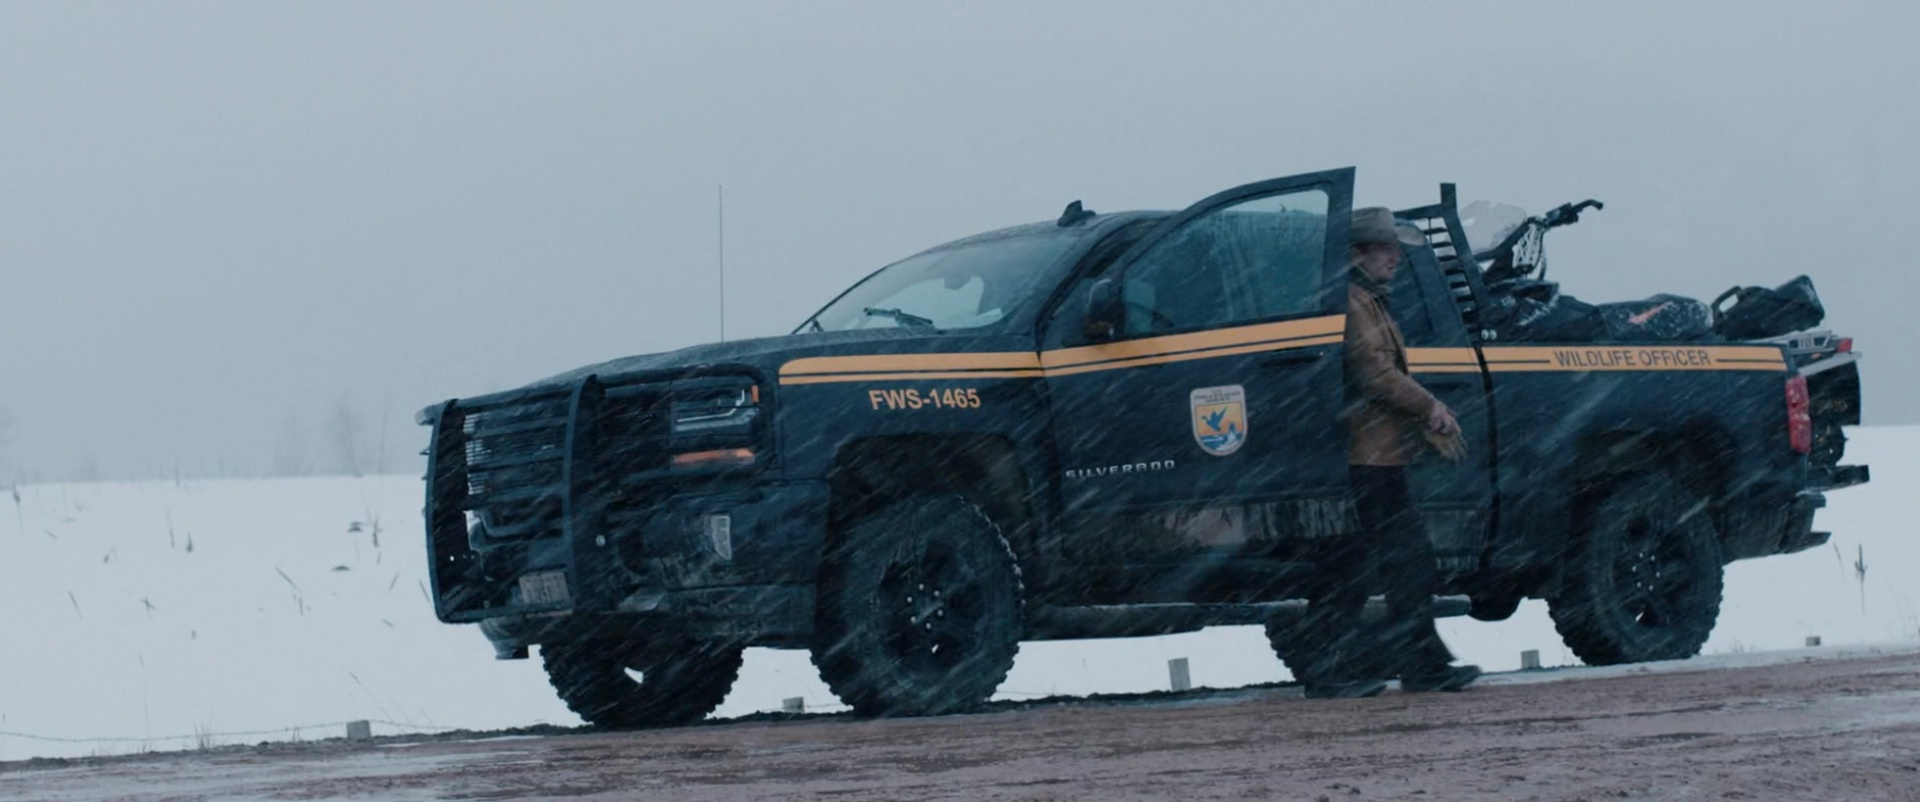 Chevrolet Silverado Pickup Truck In Wind River 2017